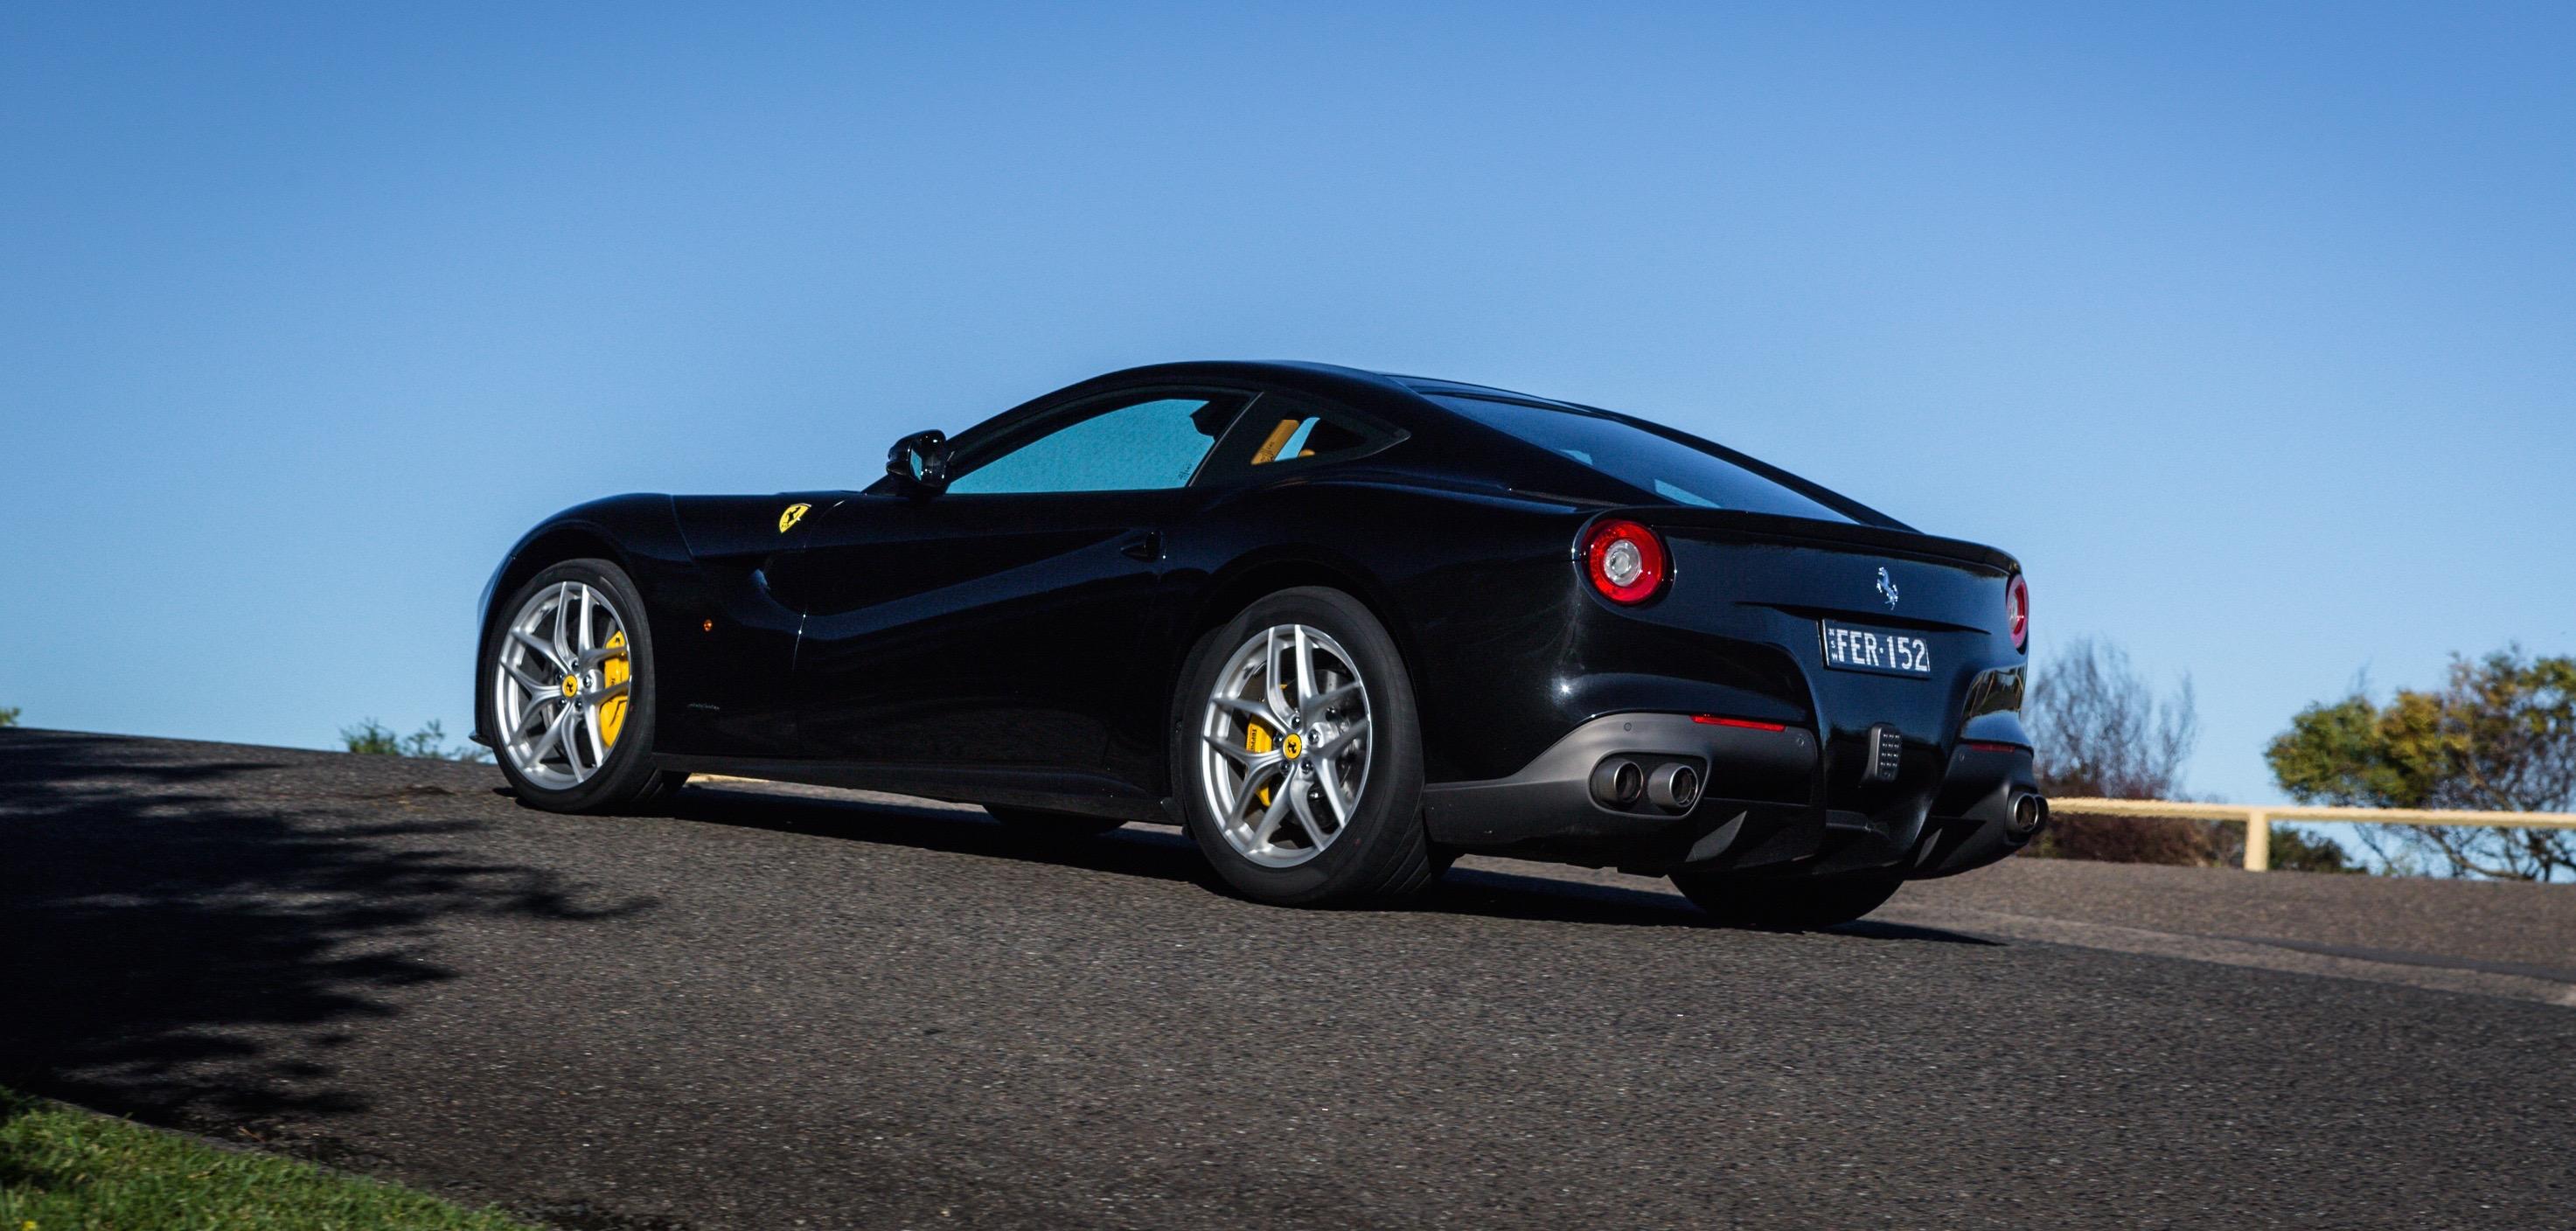 Ferrari F12 Price >> 2016 Ferrari F12 Berlinetta review - photos | CarAdvice